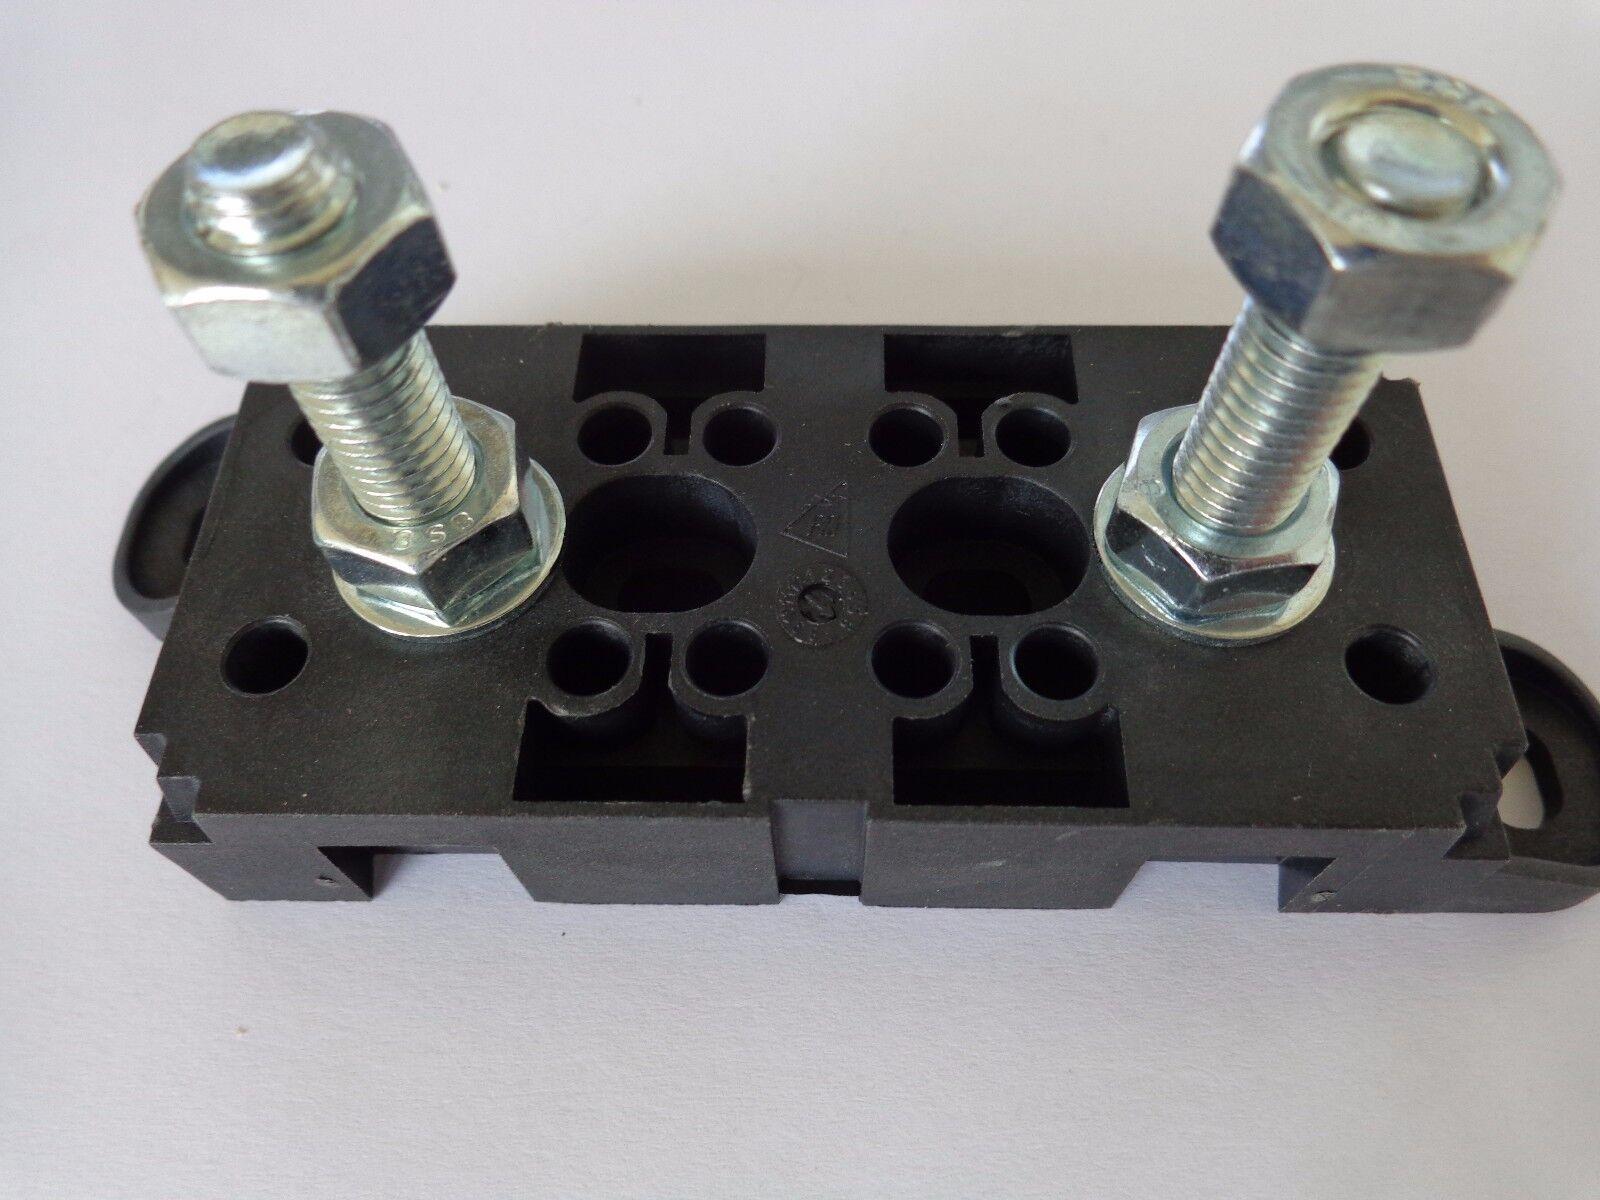 Groß Drahtstärke 6 Bilder - Schaltplan Serie Circuit Collection ...